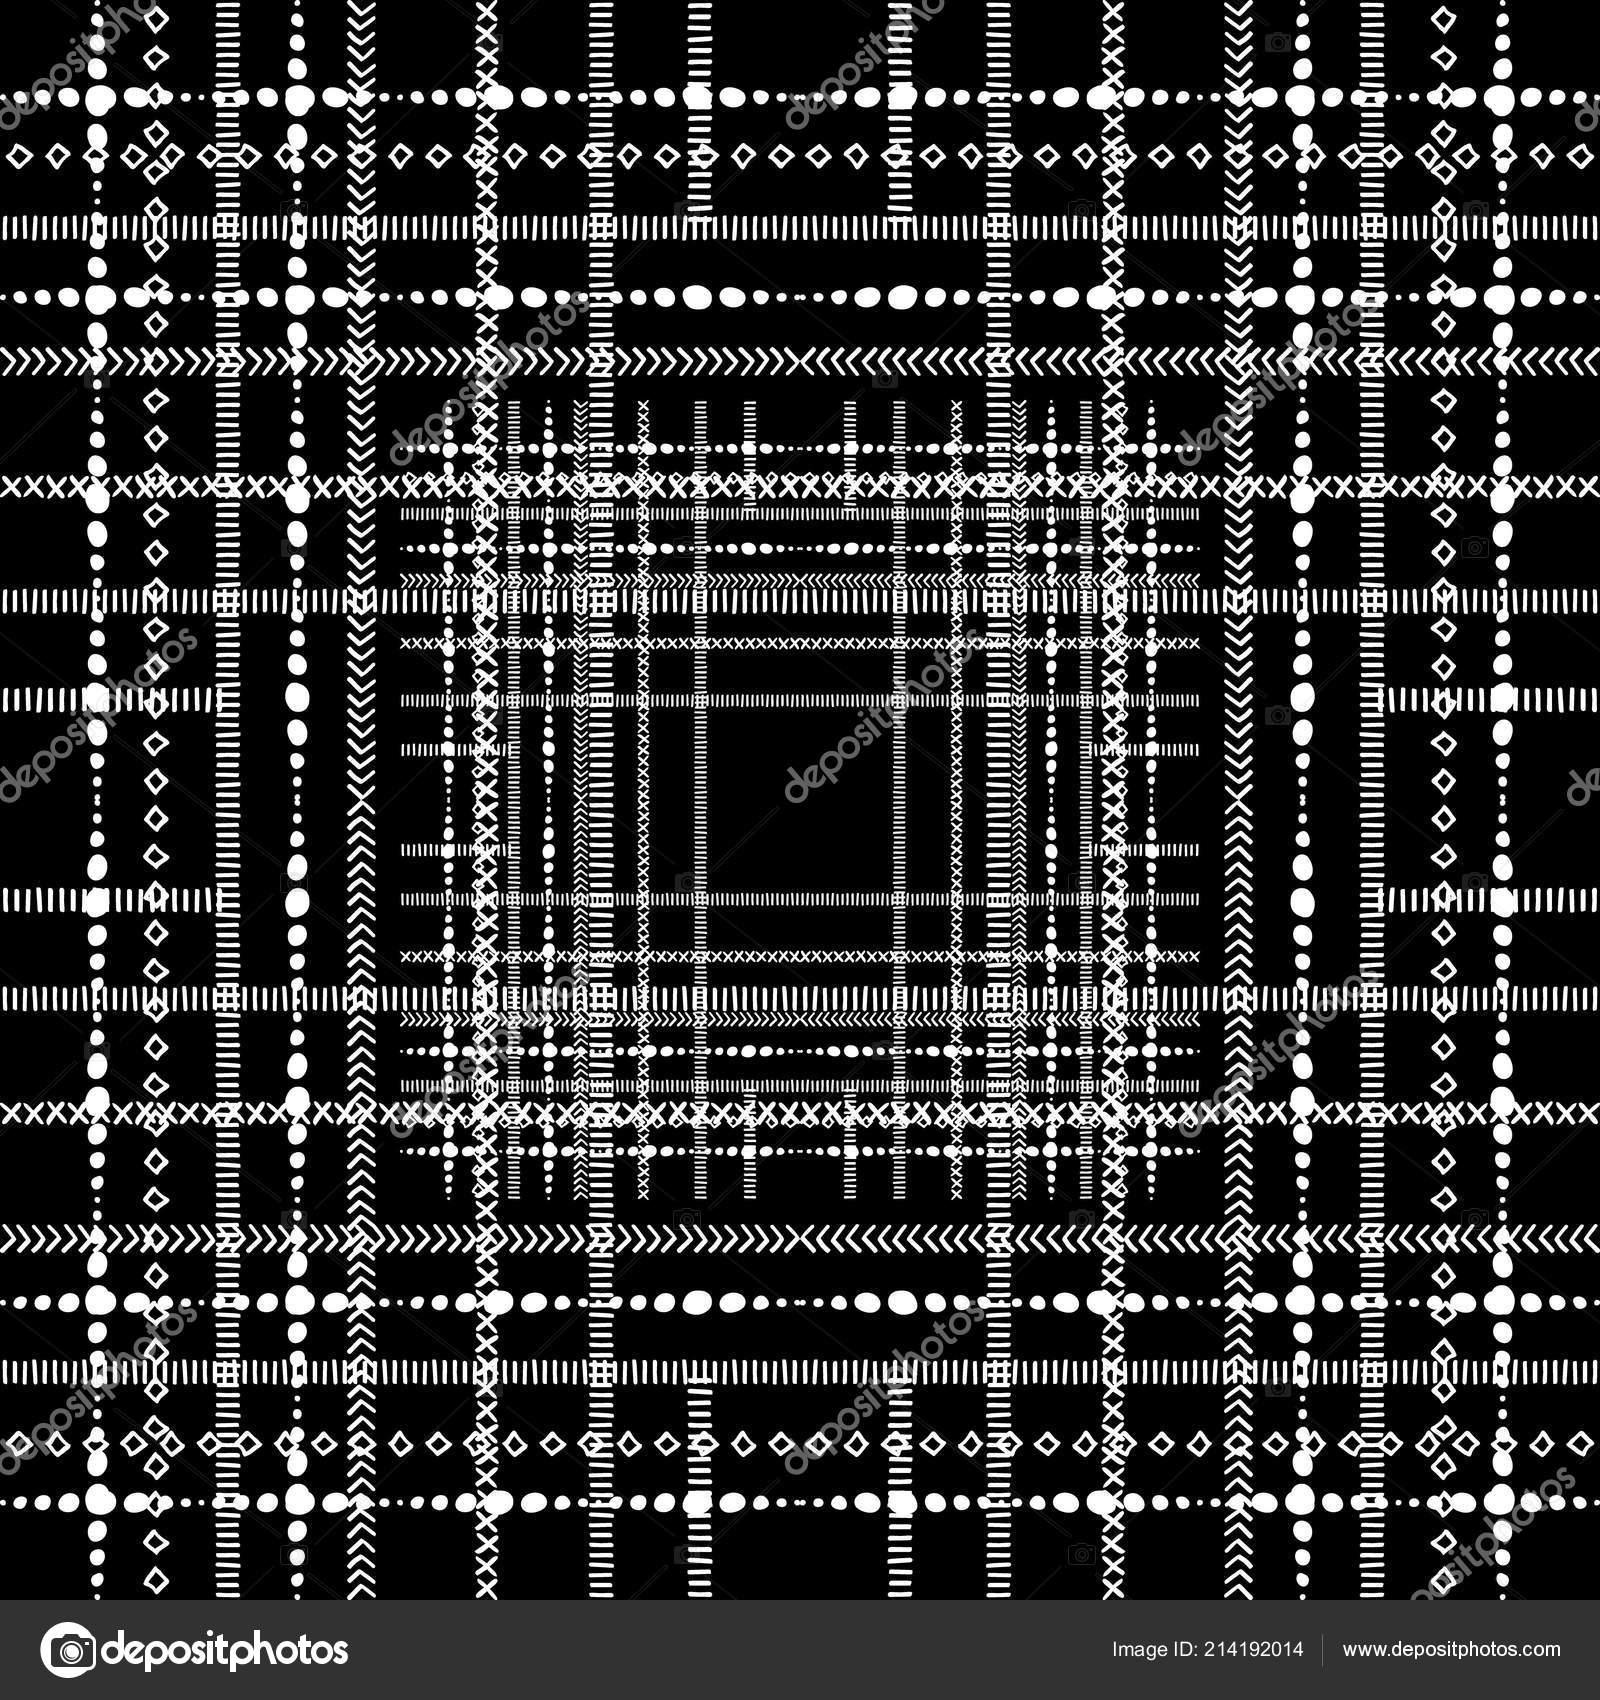 xnxxl černá